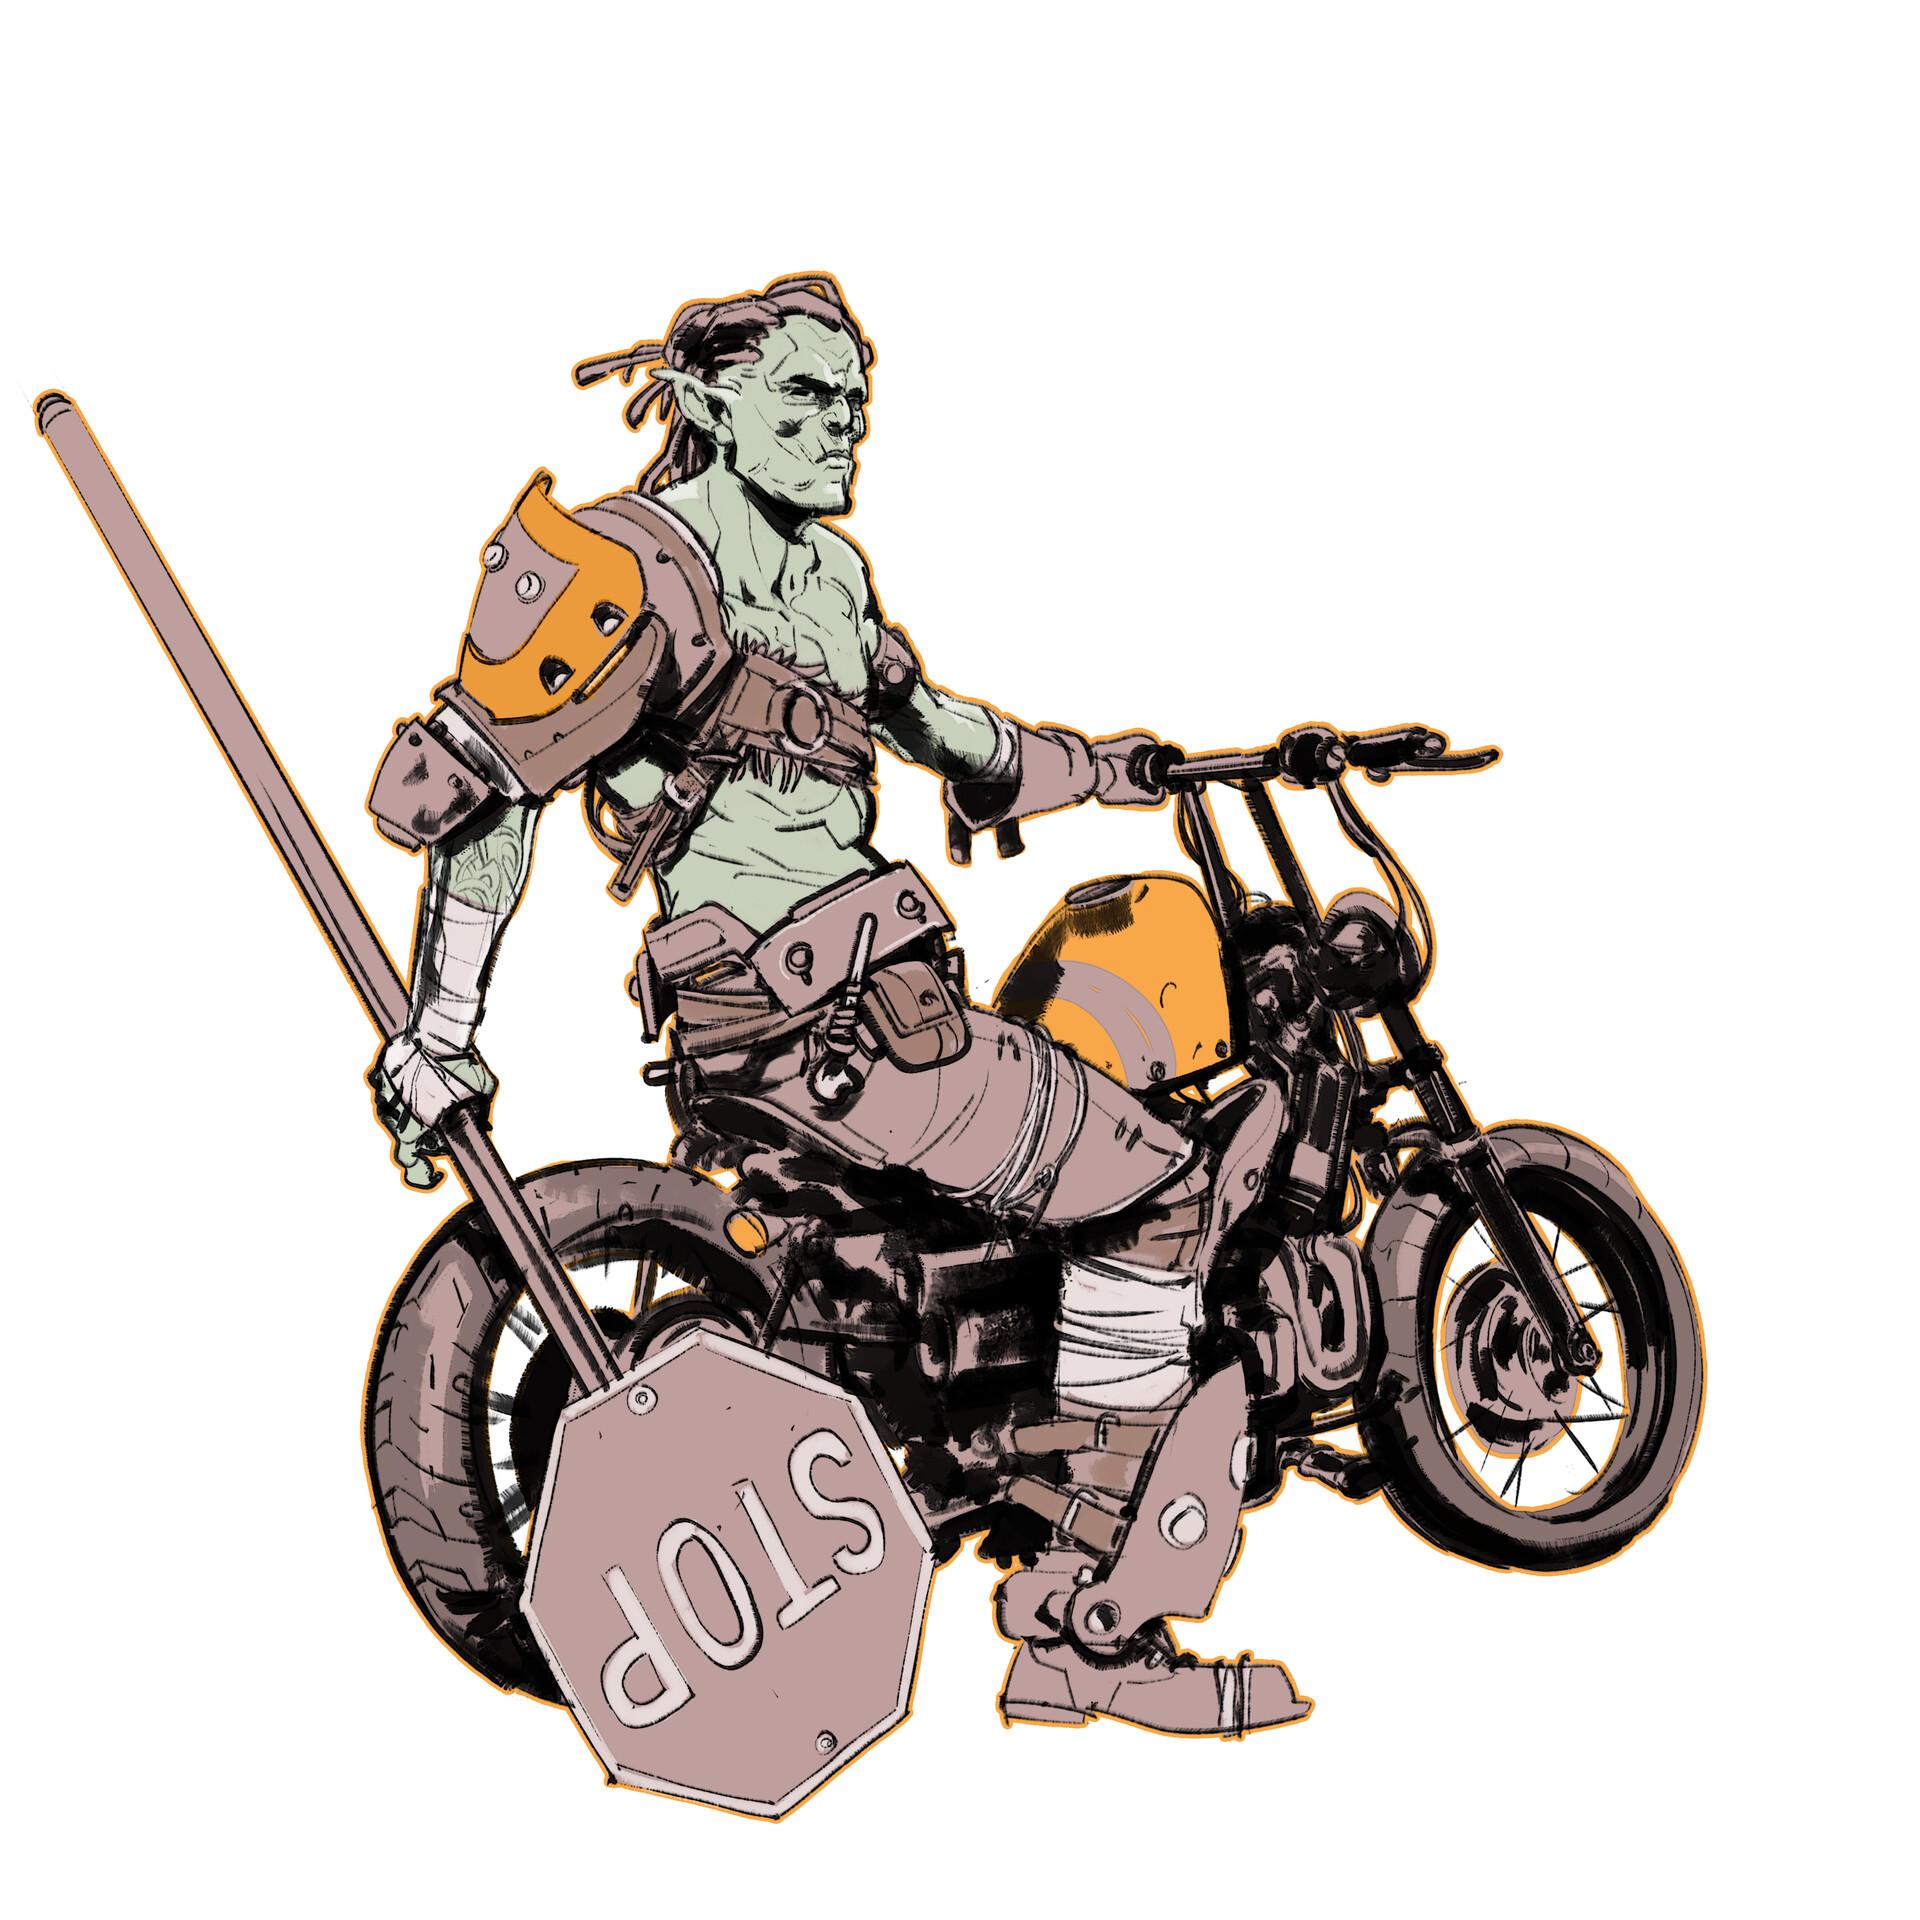 Chris ortega bike